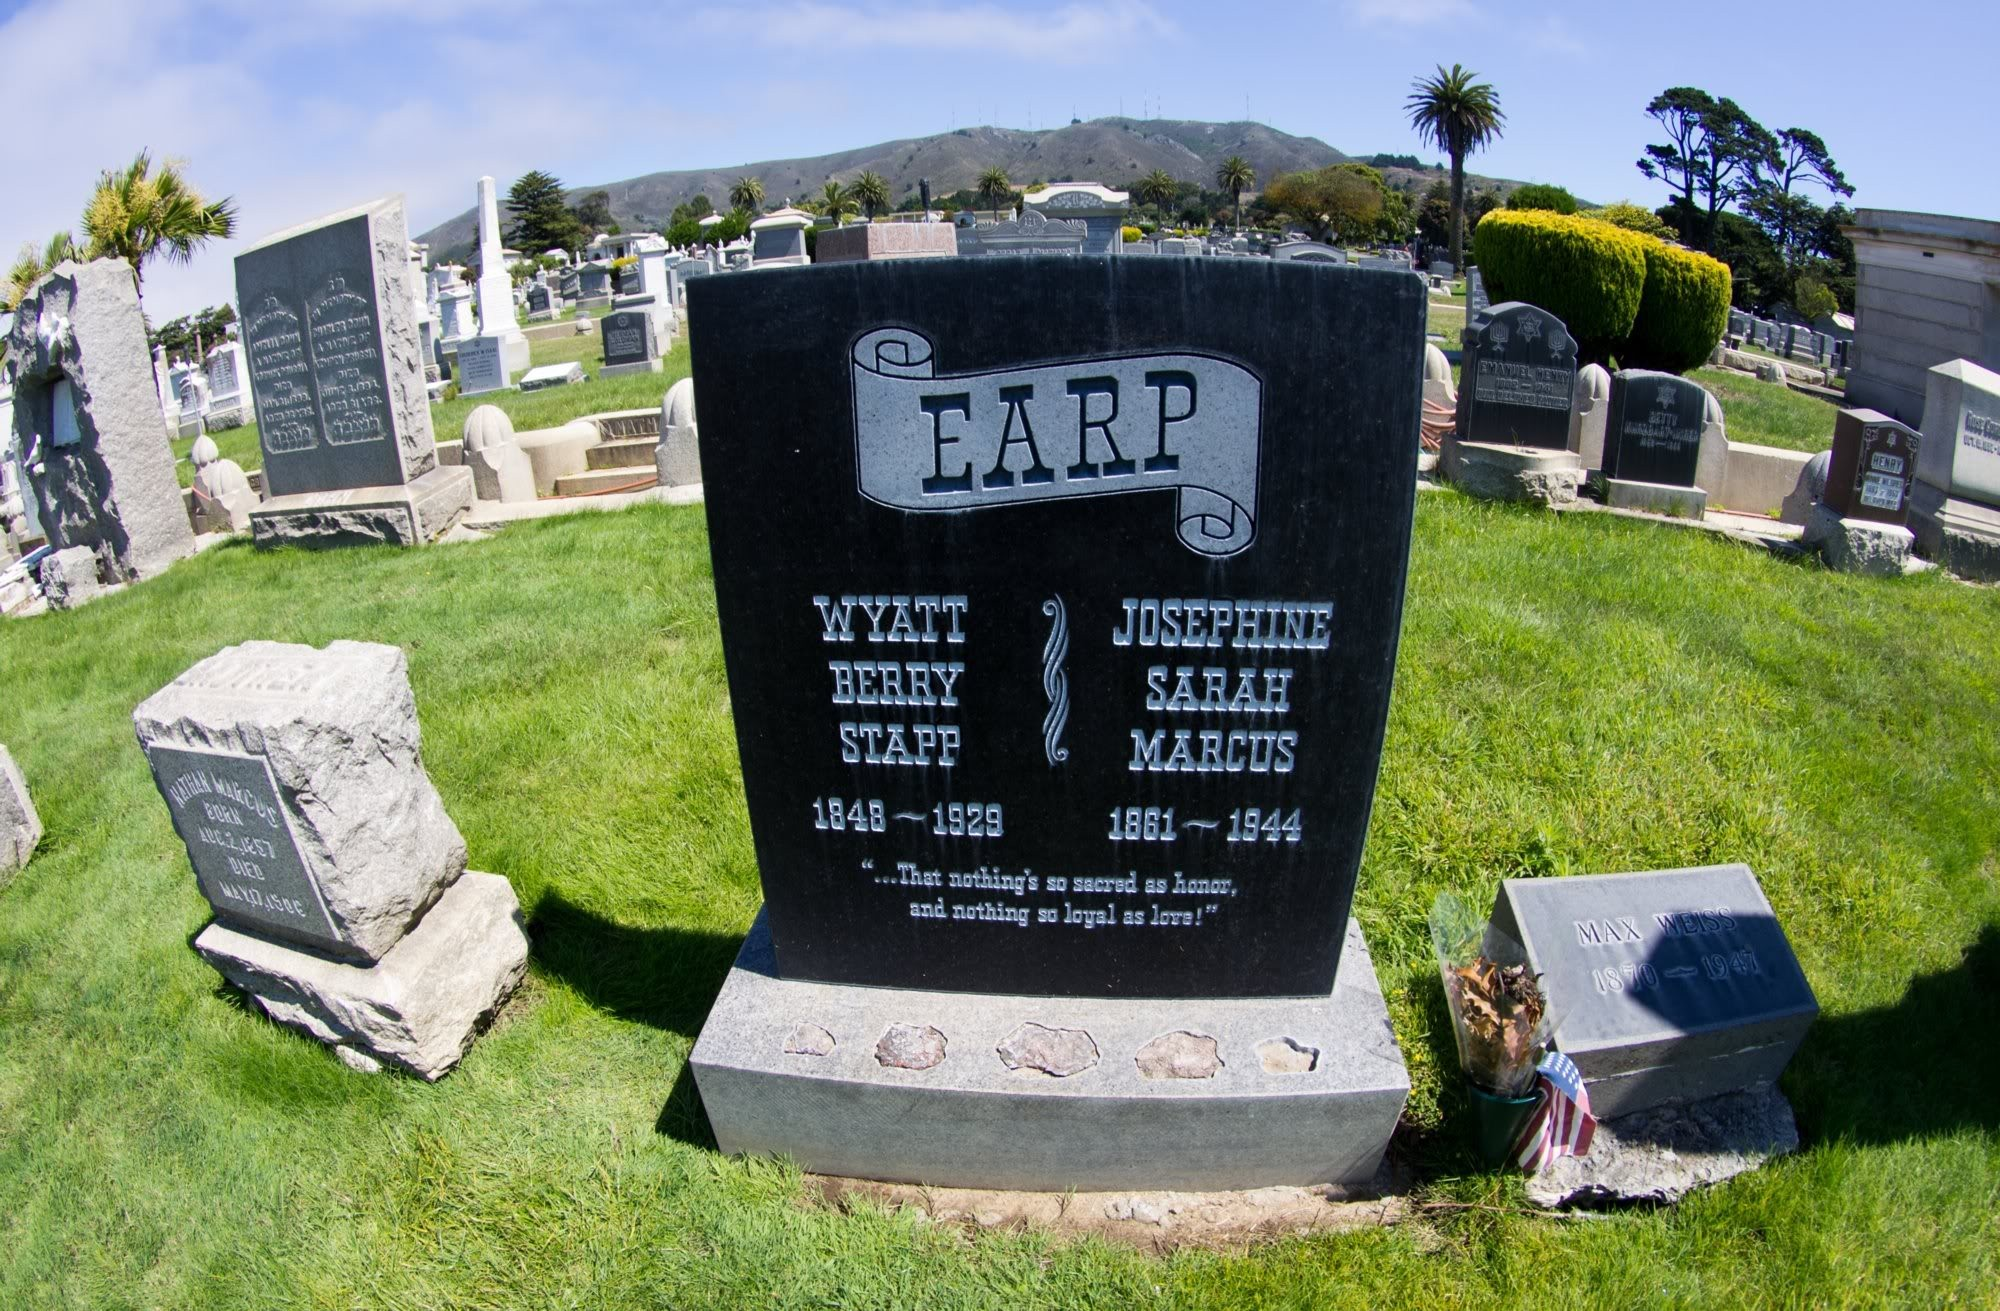 могила Эрпа